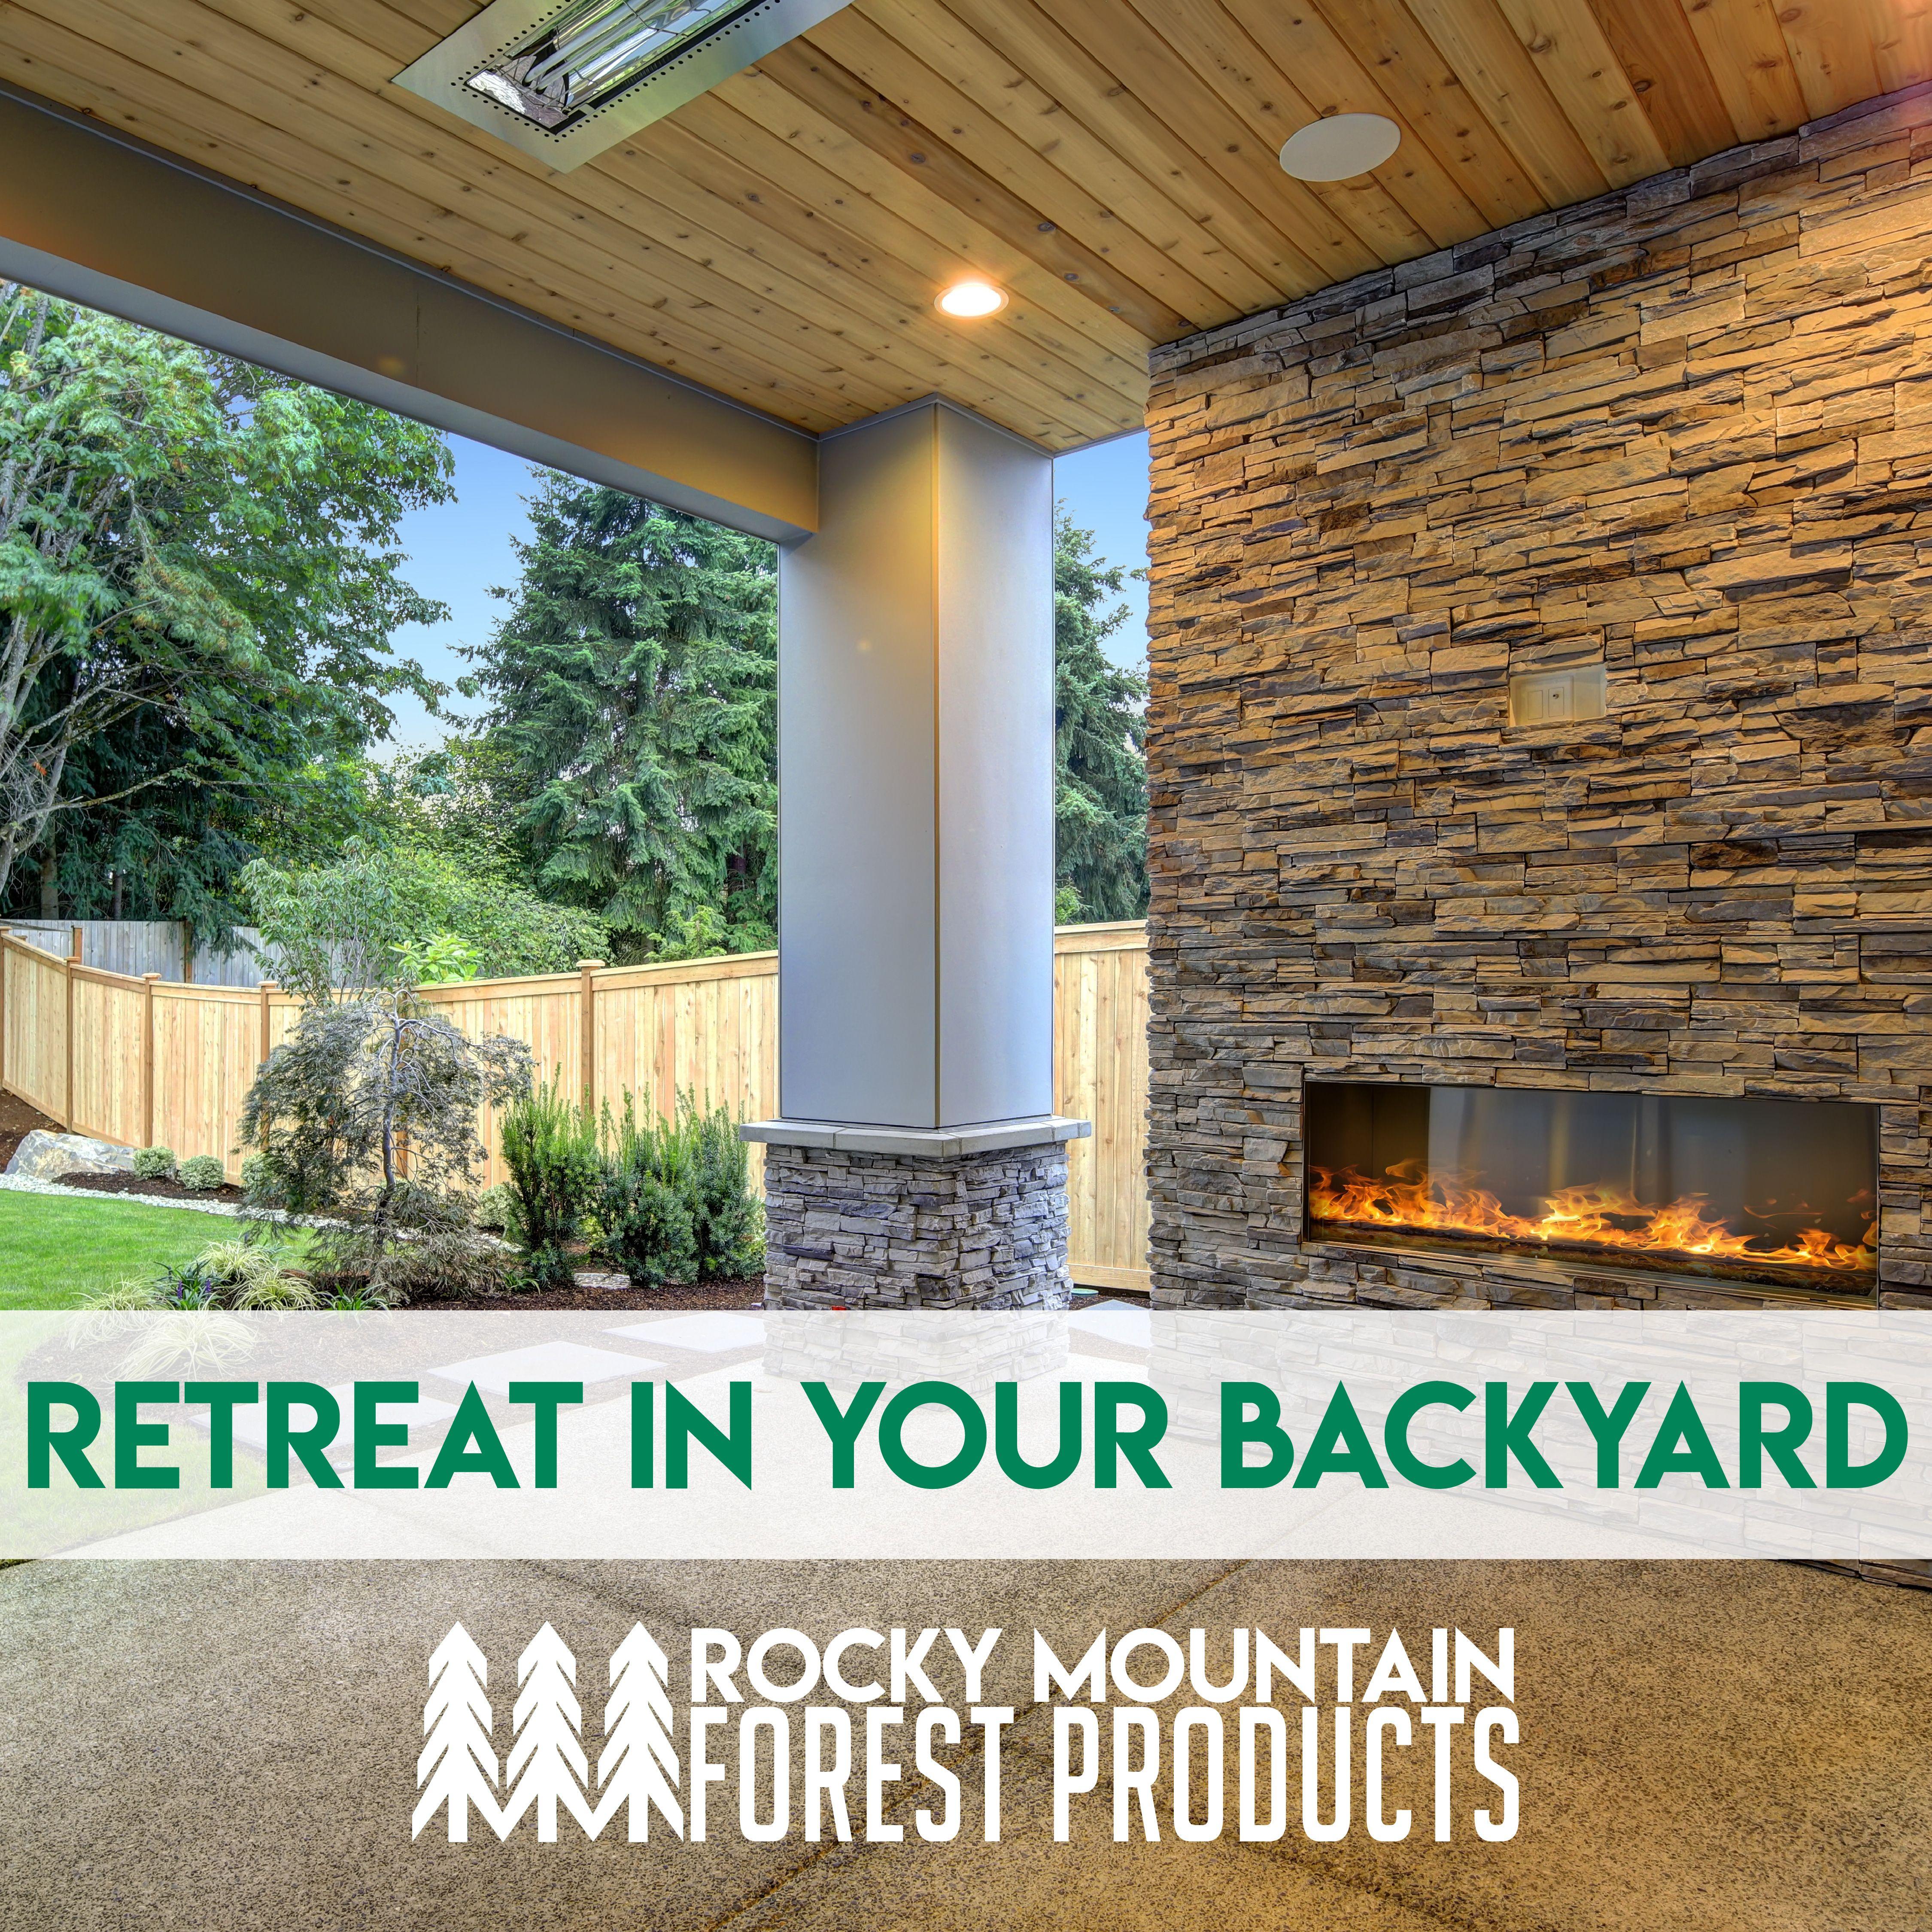 Denver Wooden Siding Materials Cedar Siding Supplies Backyard Retreat Cedar Siding Backyard